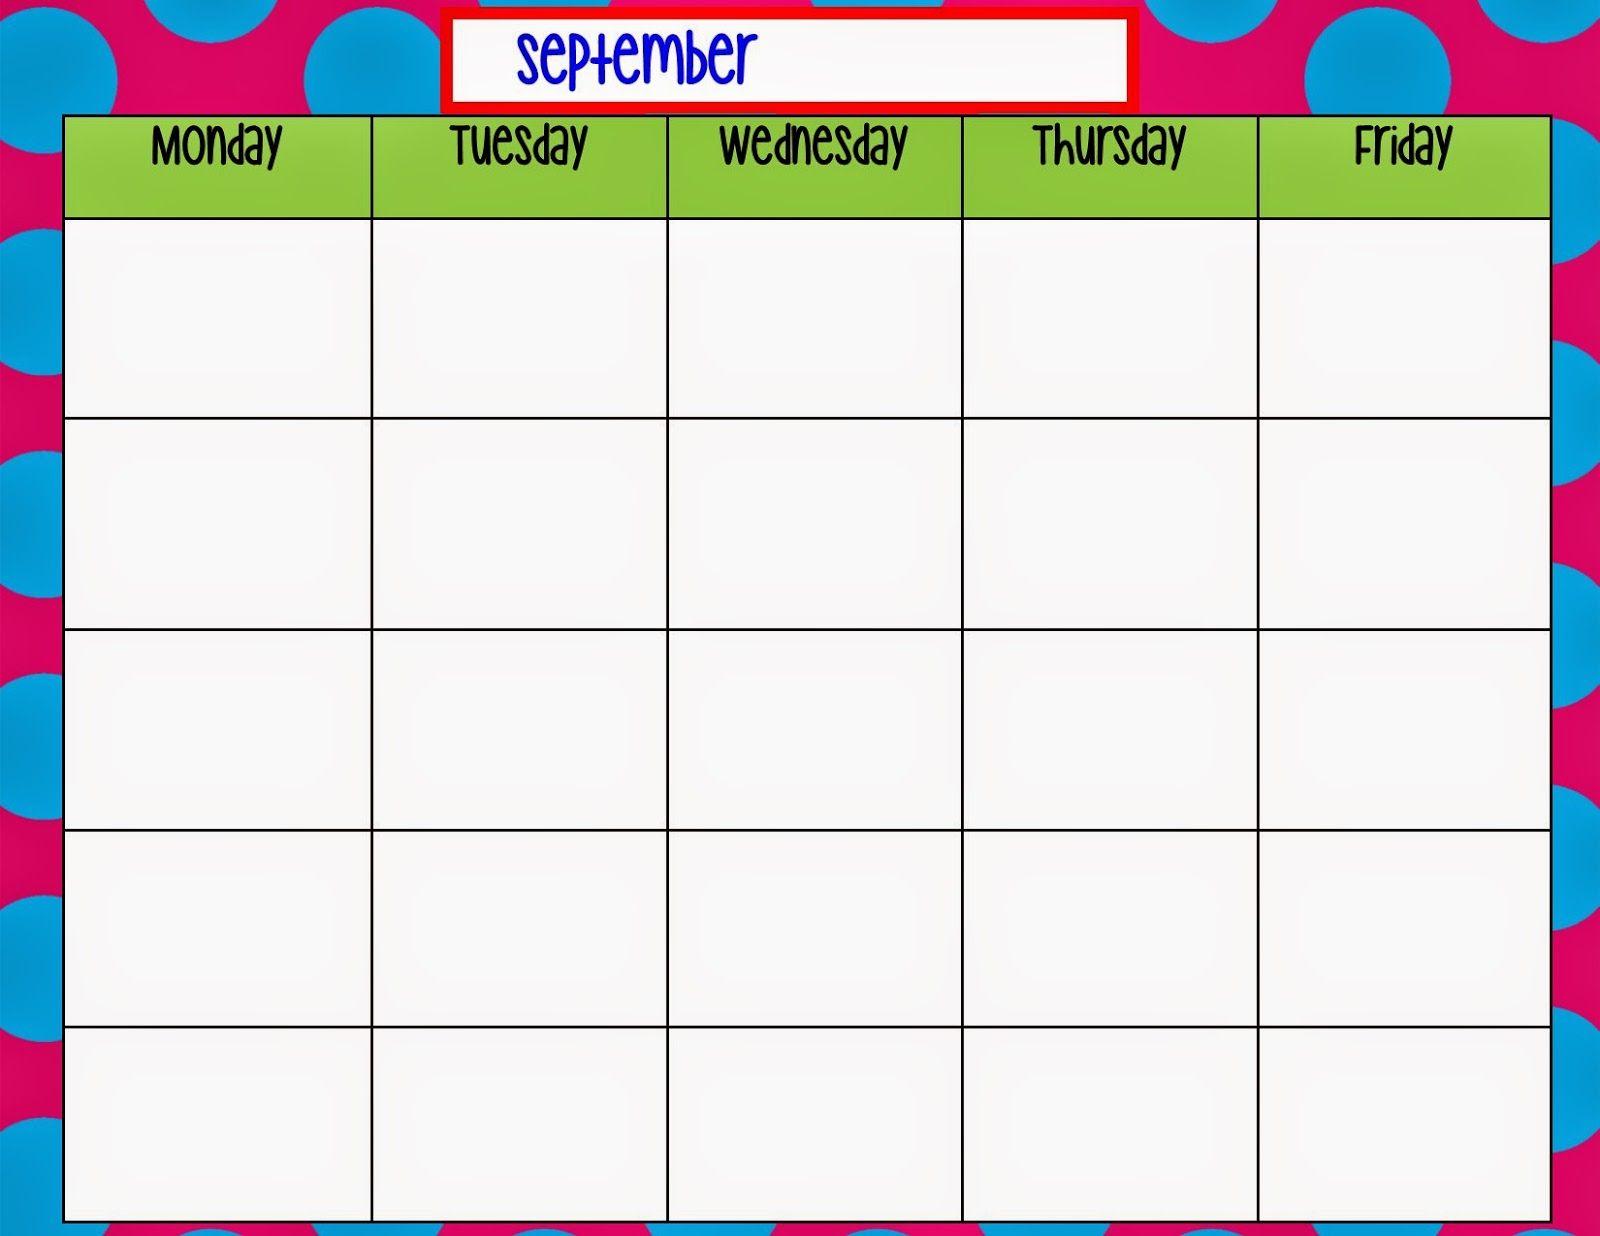 Monday Through Friday Calendar Template   Weekly Calendar within Monday To Sunday Calendar Template